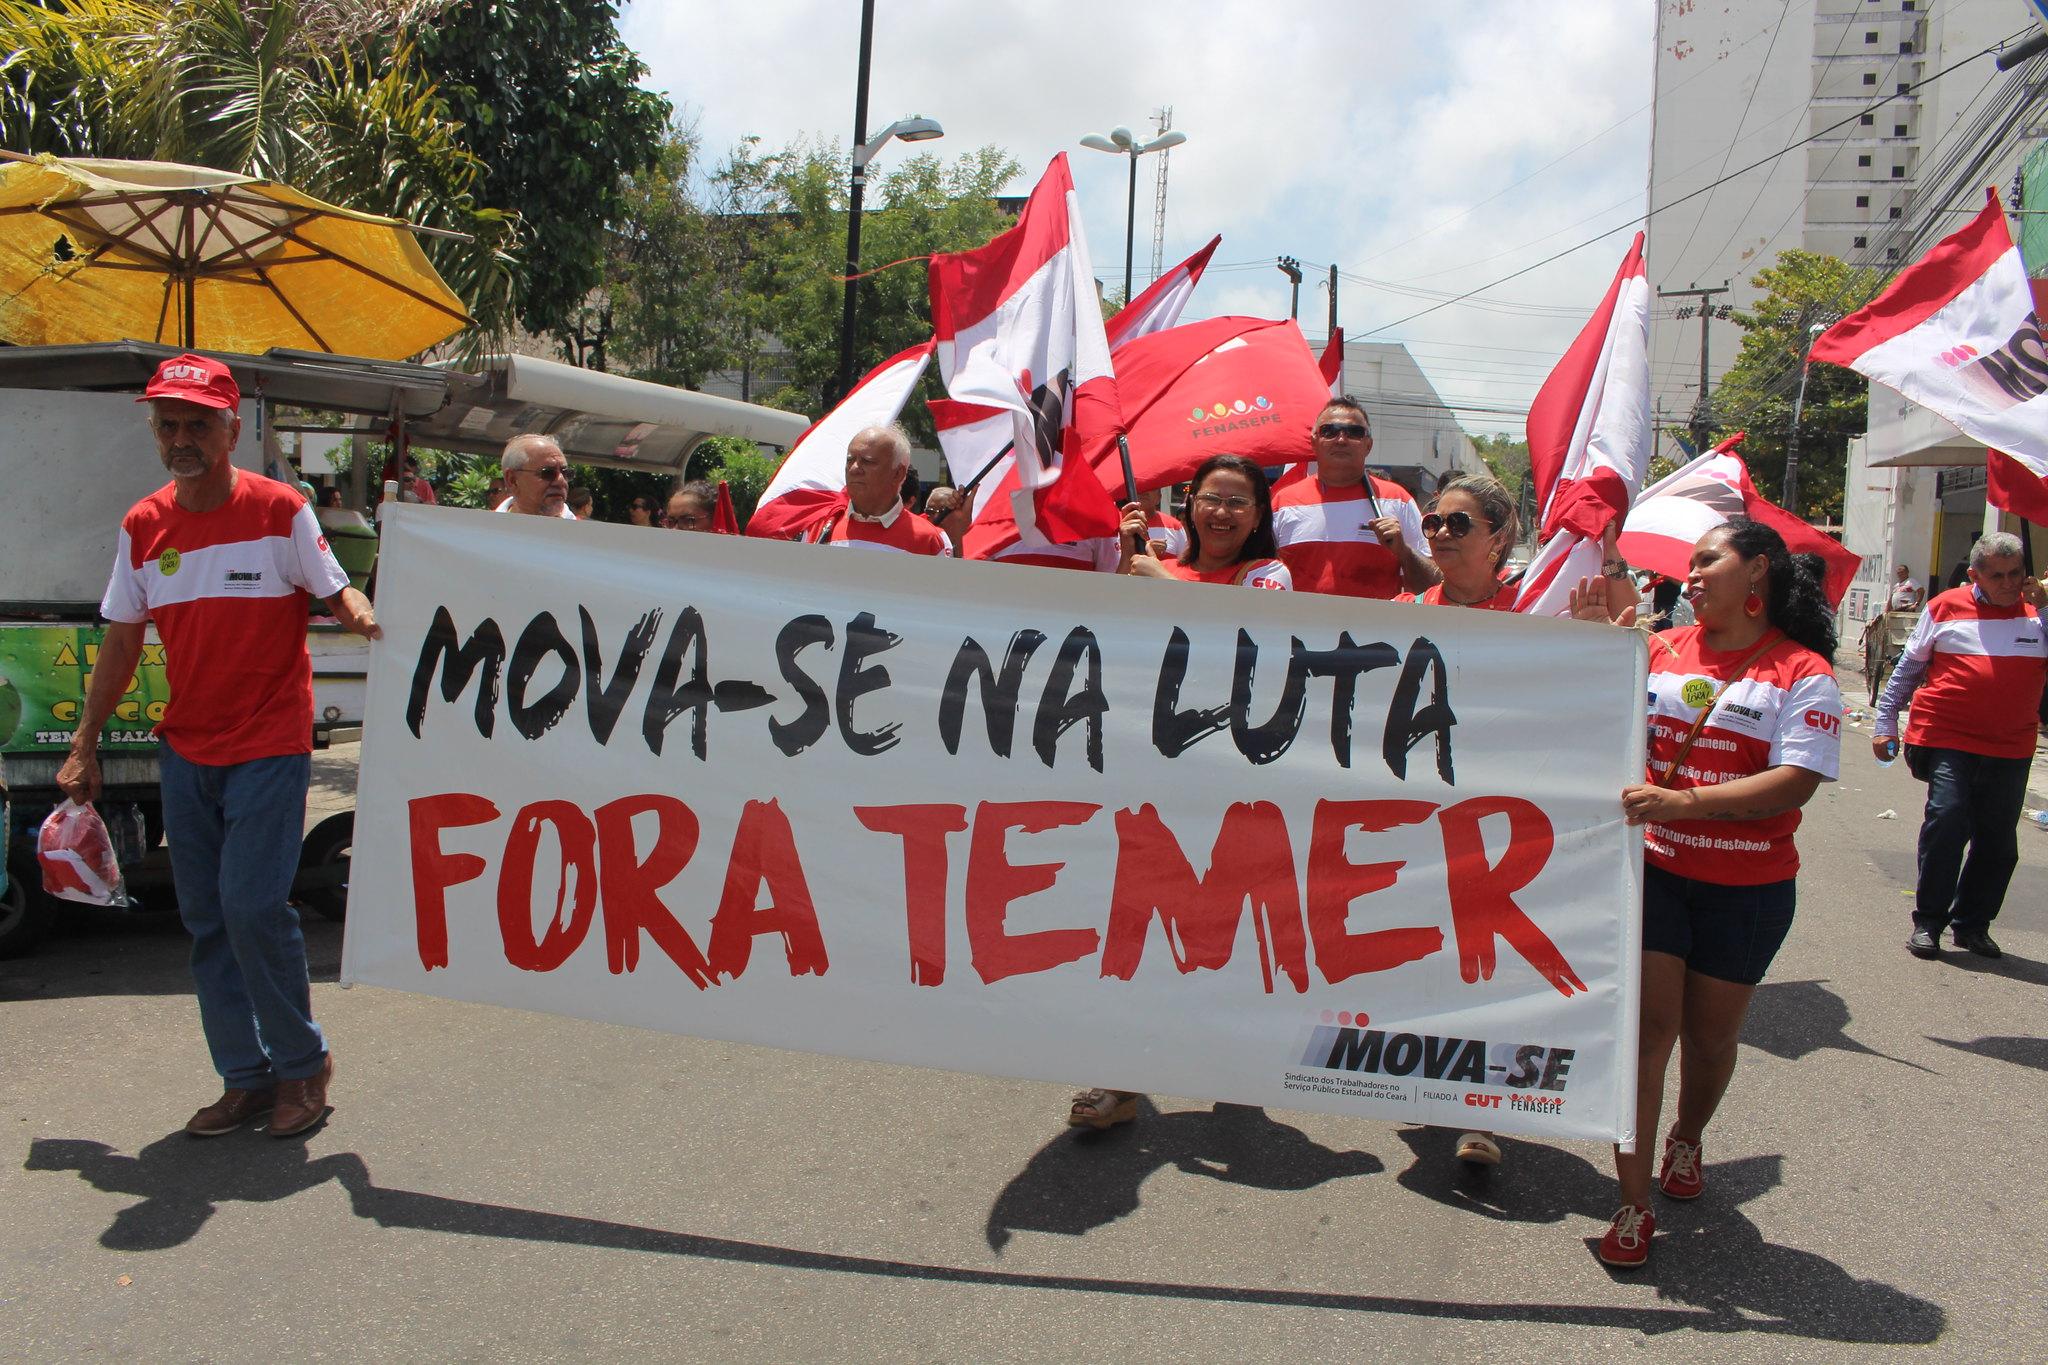 VII Marcha dos Servidores - 16/09/2016